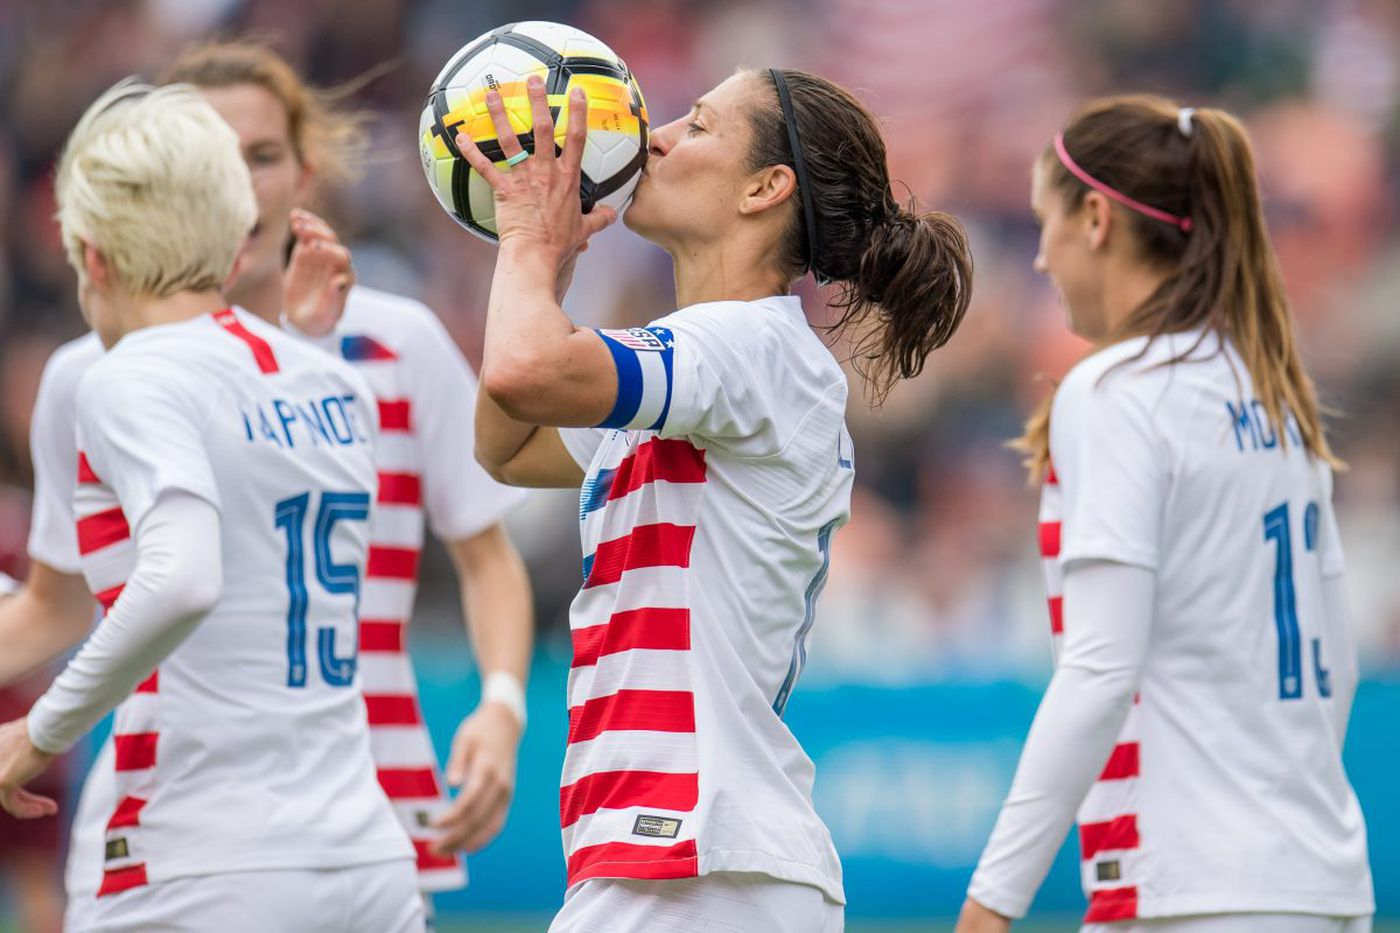 Carli Lloyd scores 100th goal for U.S. women's soccer team in 6-2 win over Mexico